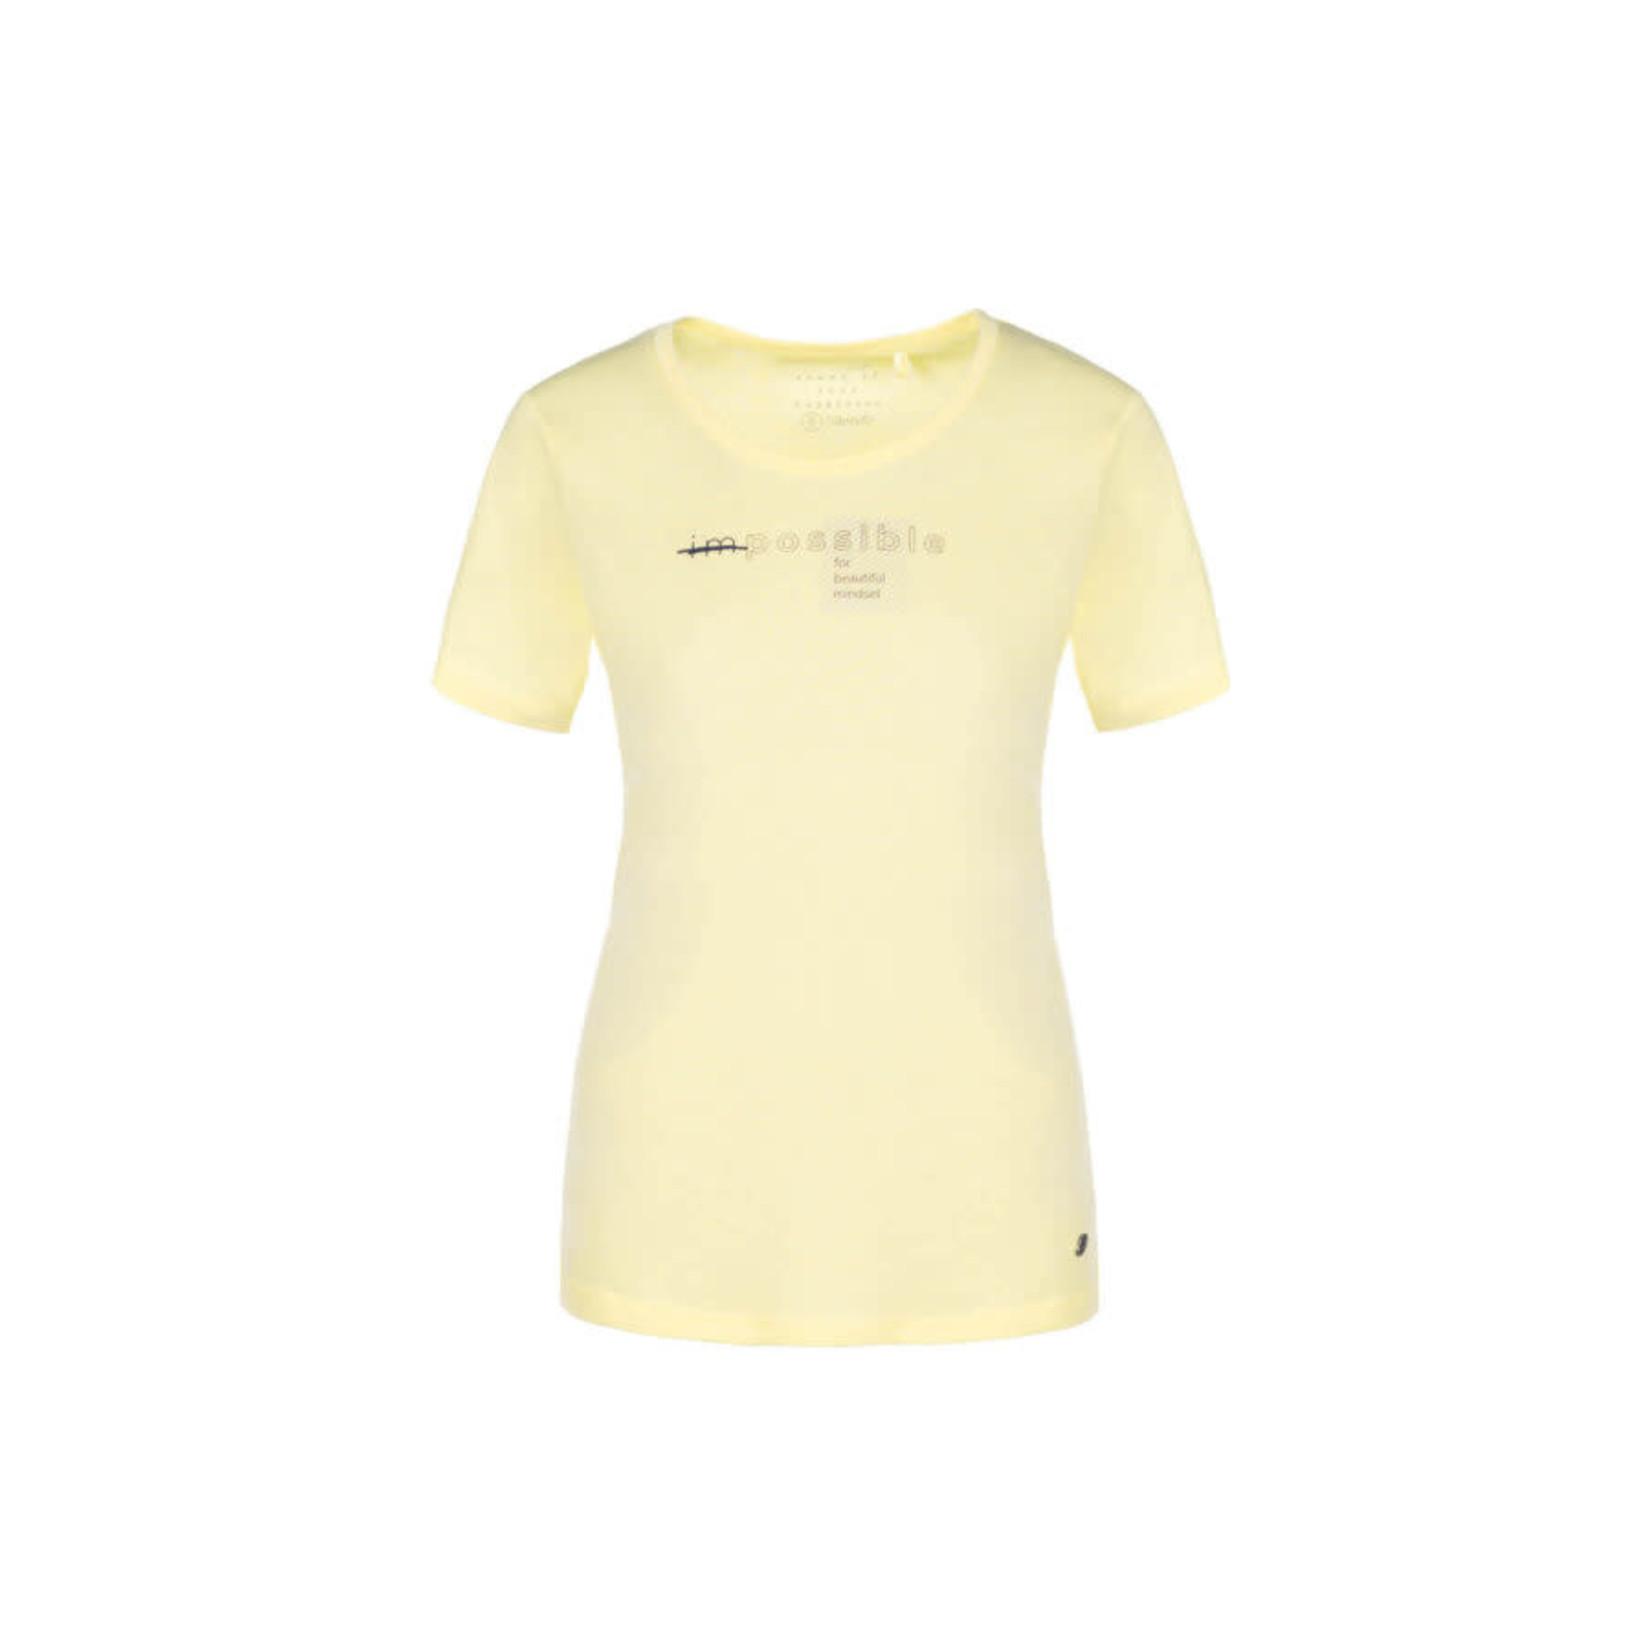 Soquesto Soquesto shirt 6180-501860